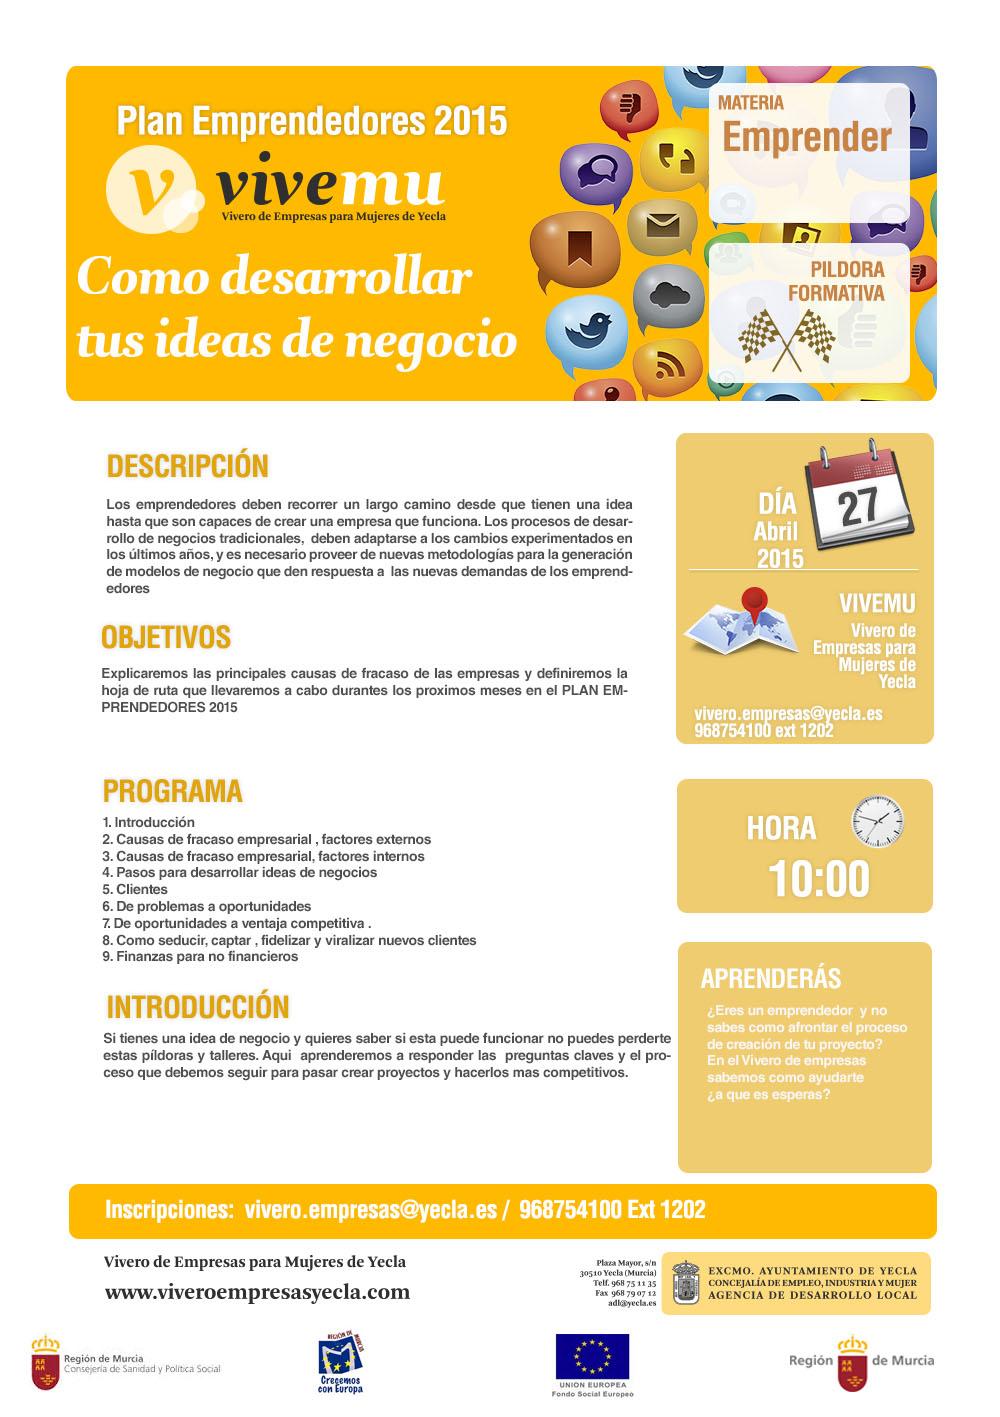 IDEAS DE NEGOCIO - DESCRIPCION